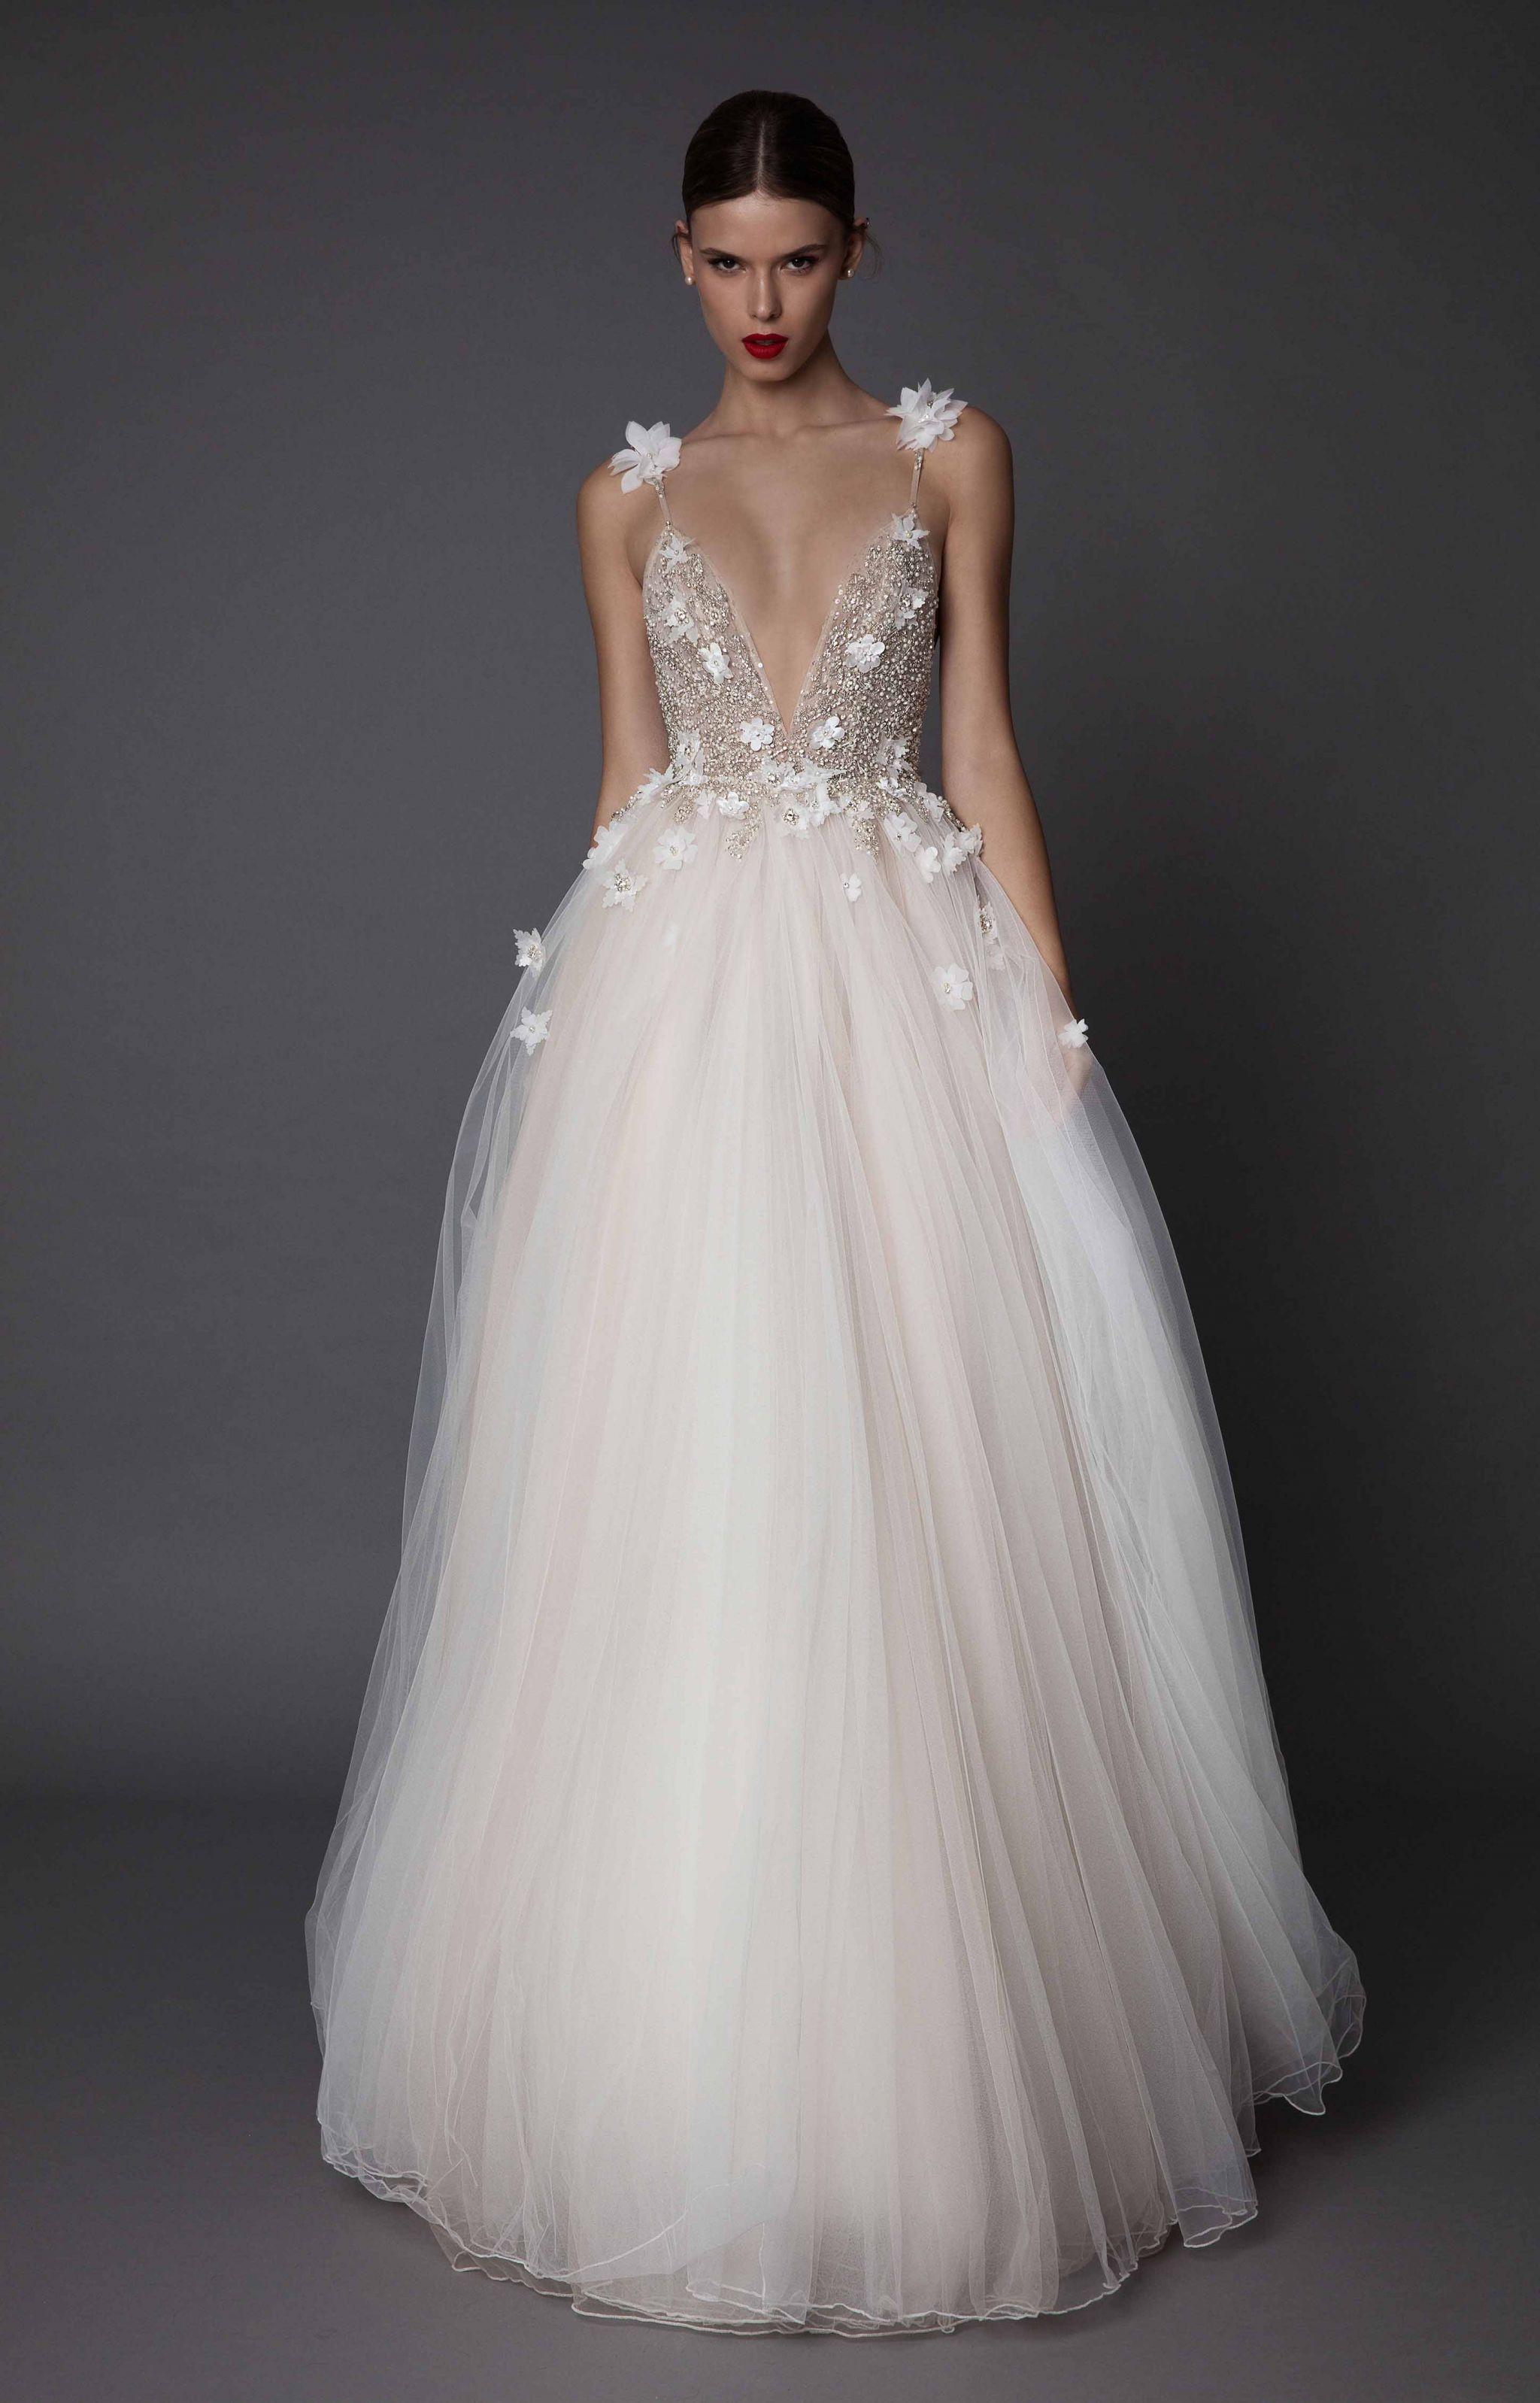 Berta Adel Wedding Dress Used Size 6 2 690 Wedding Dresses Wedding Dresses Beaded Bridal Dresses